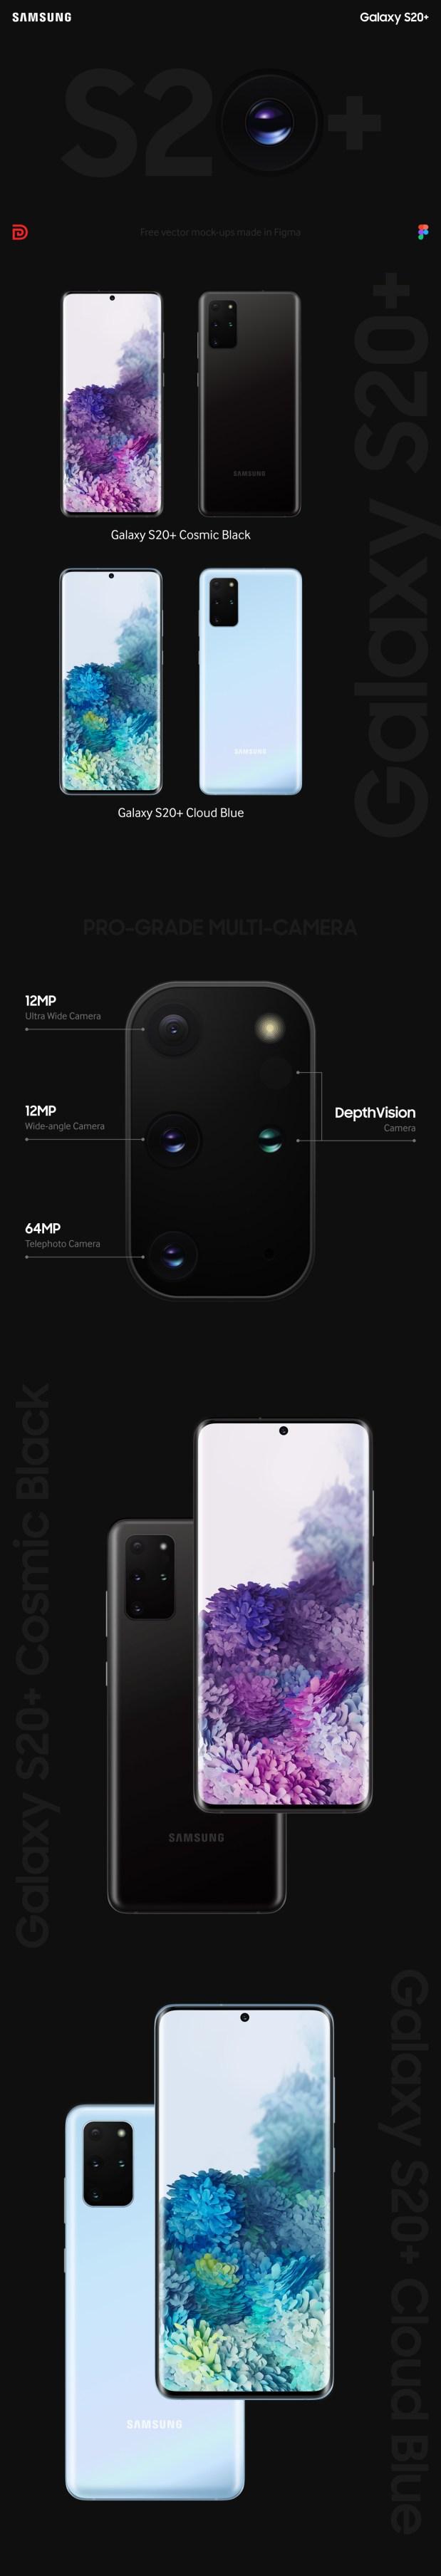 Galaxy S20+ Free Mock-ups Made in Figma